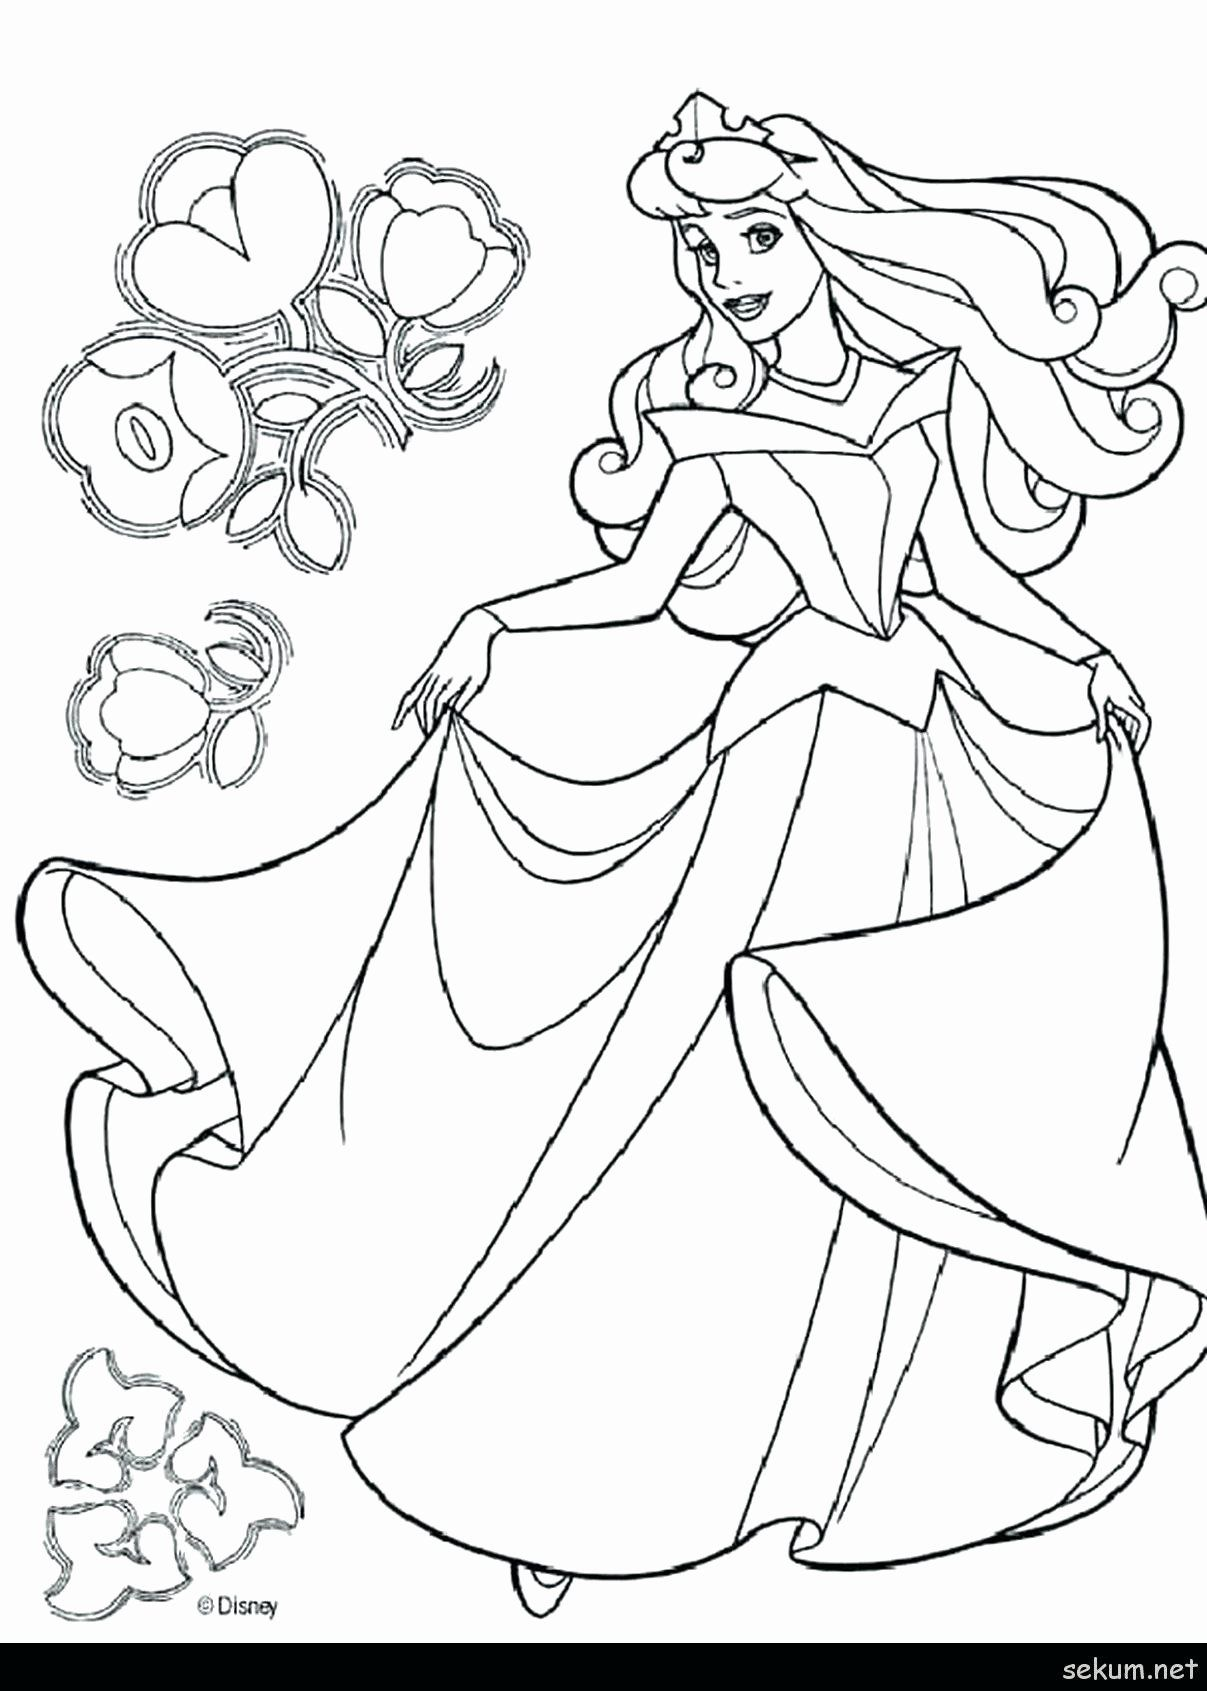 Fashion Dress Coloring Pages New Coloring Pages Princess Aurora Sandboxpaper Disney Pokemon Belle